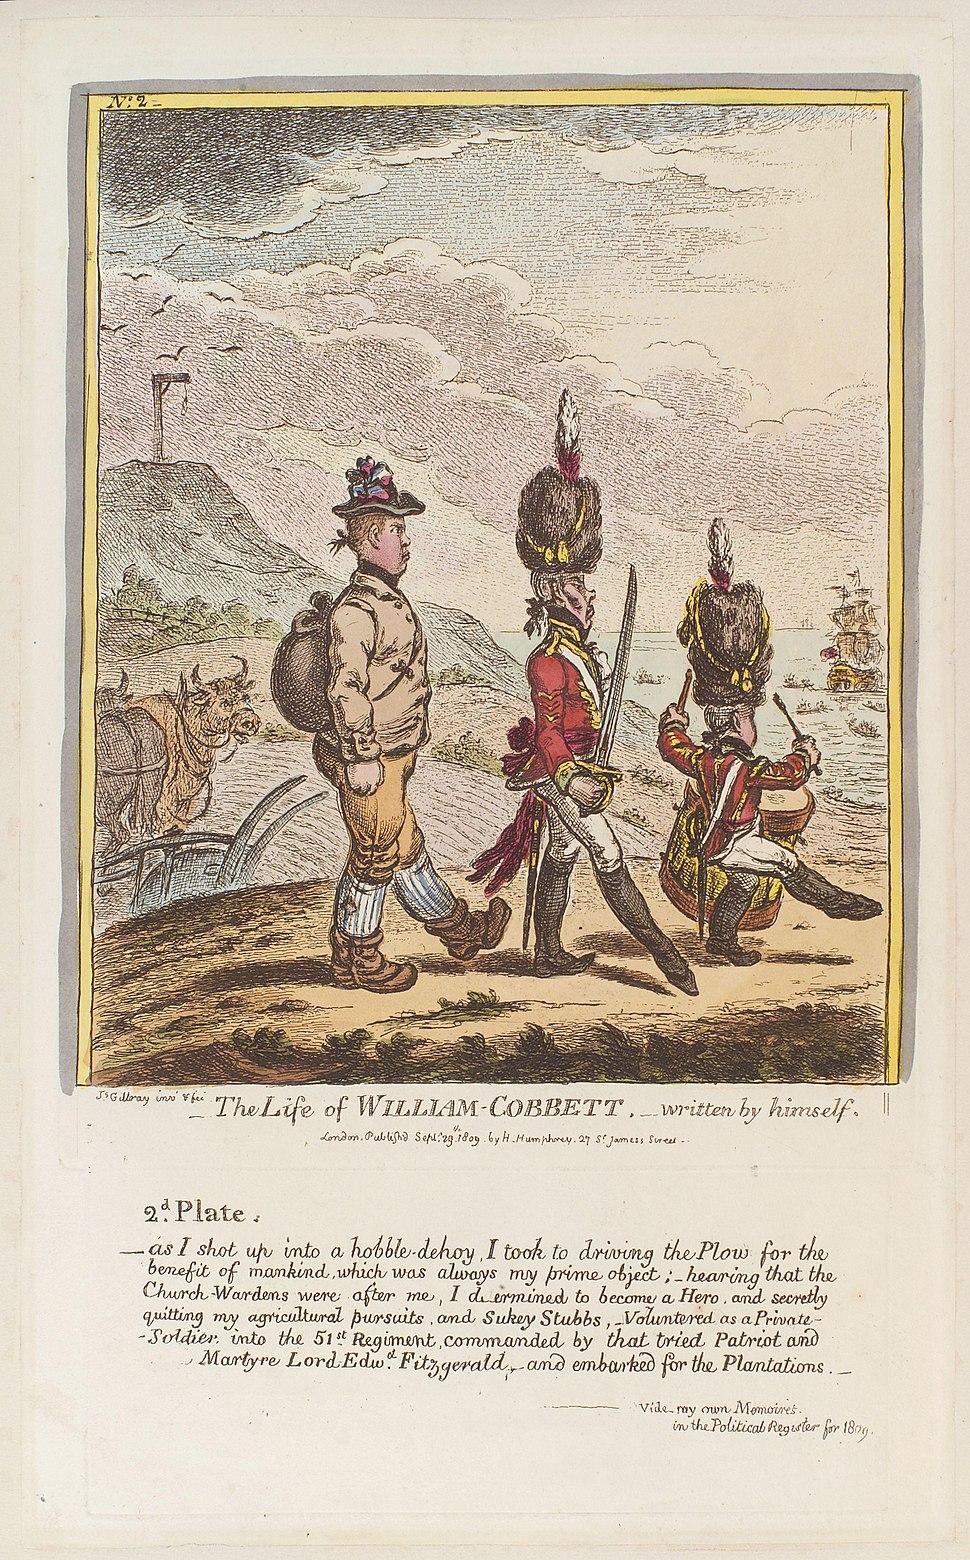 The life of William Cobbett - written by himself. No 2' (William Cobbett) by James Gillray